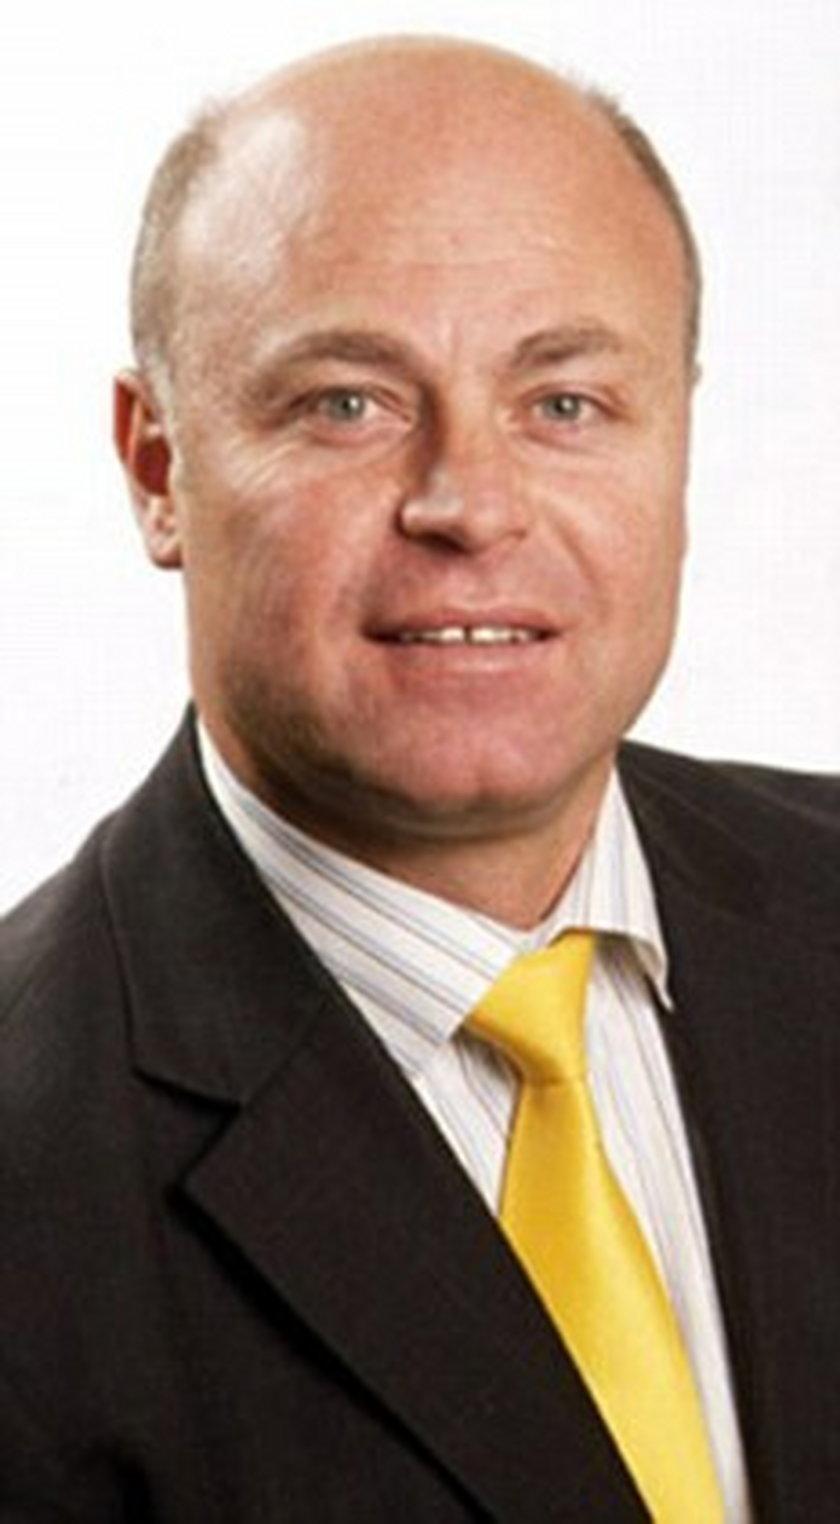 Albert Rizk